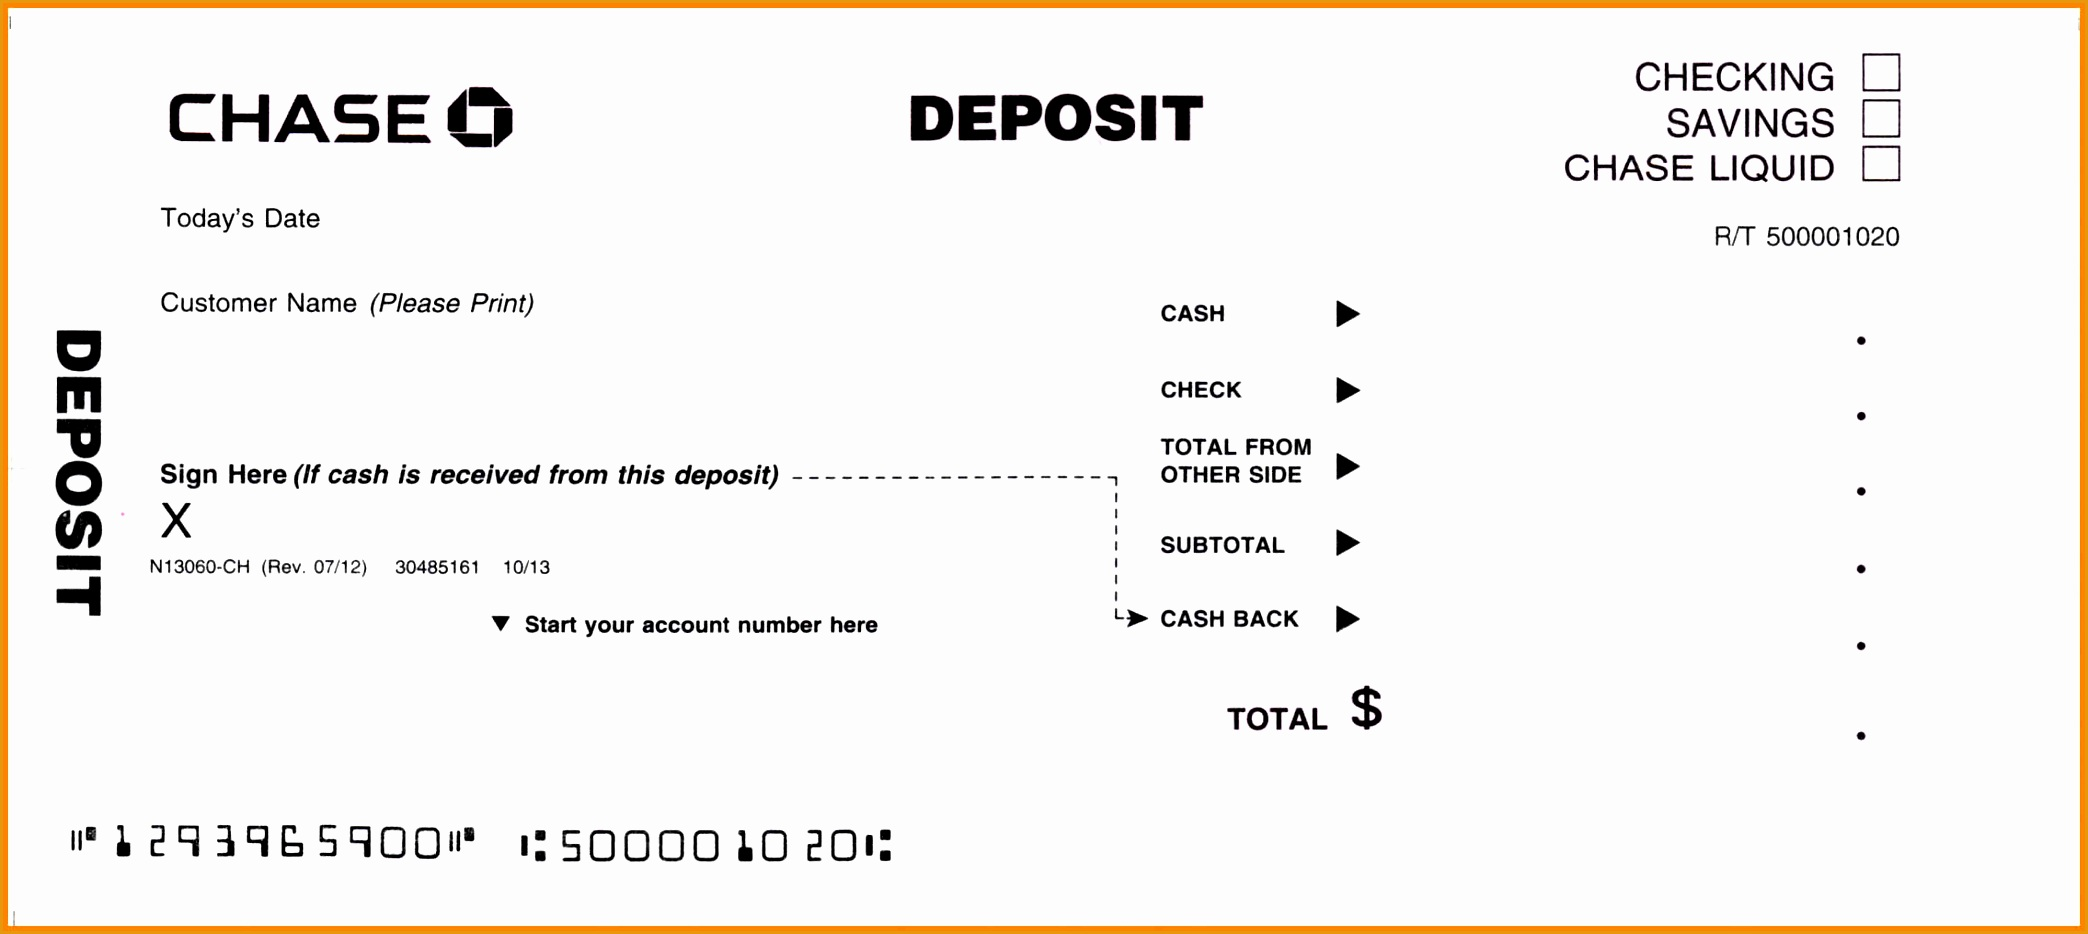 deposit slip template9342088